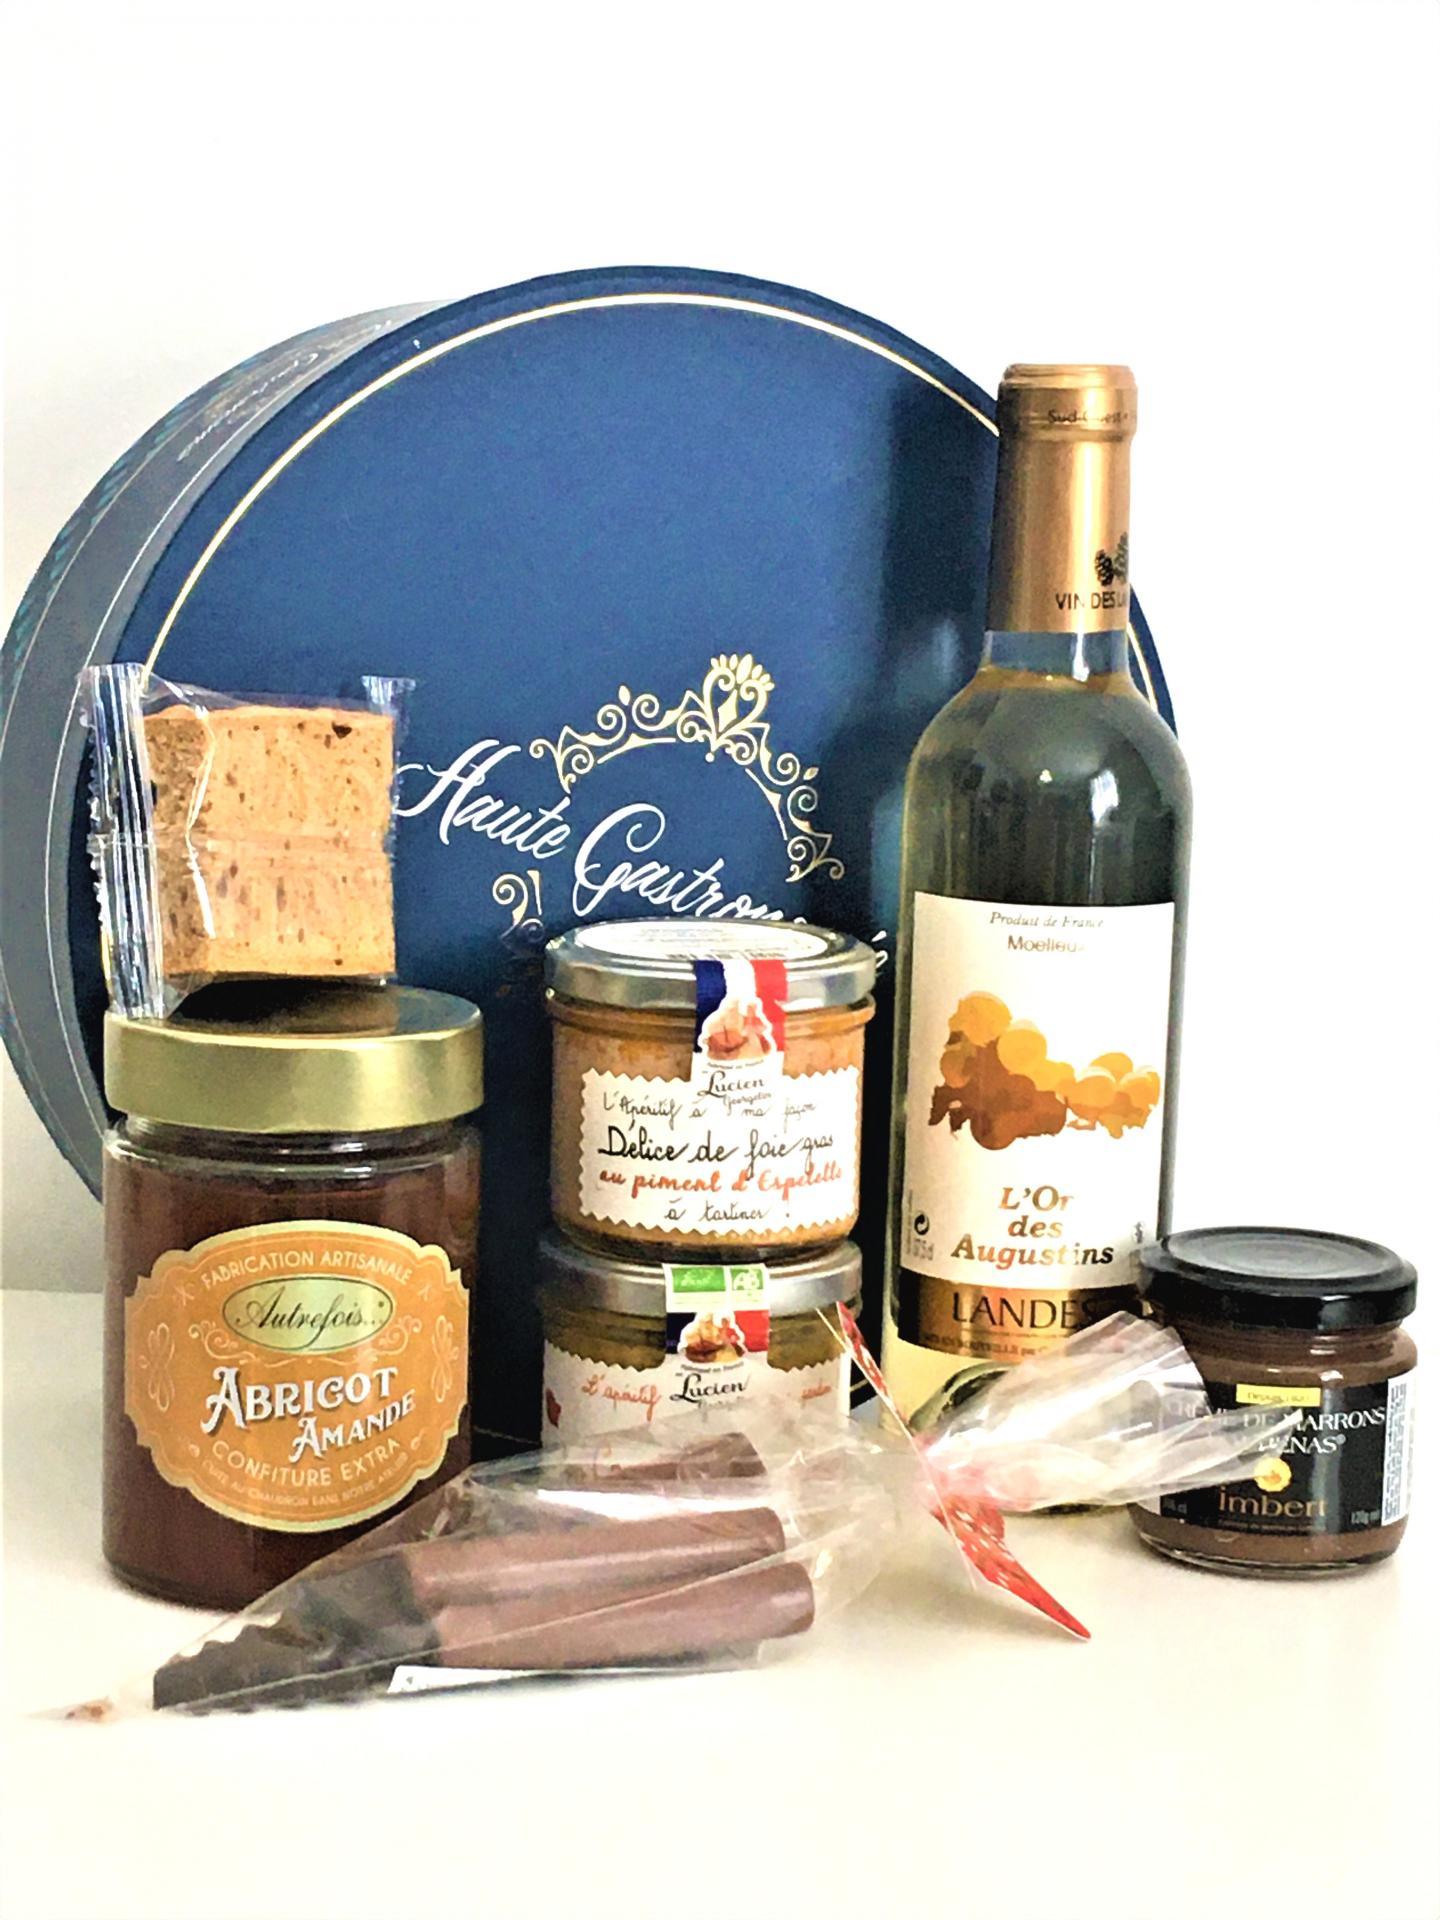 Azur gourmand panier gourmand de noel ccas 1